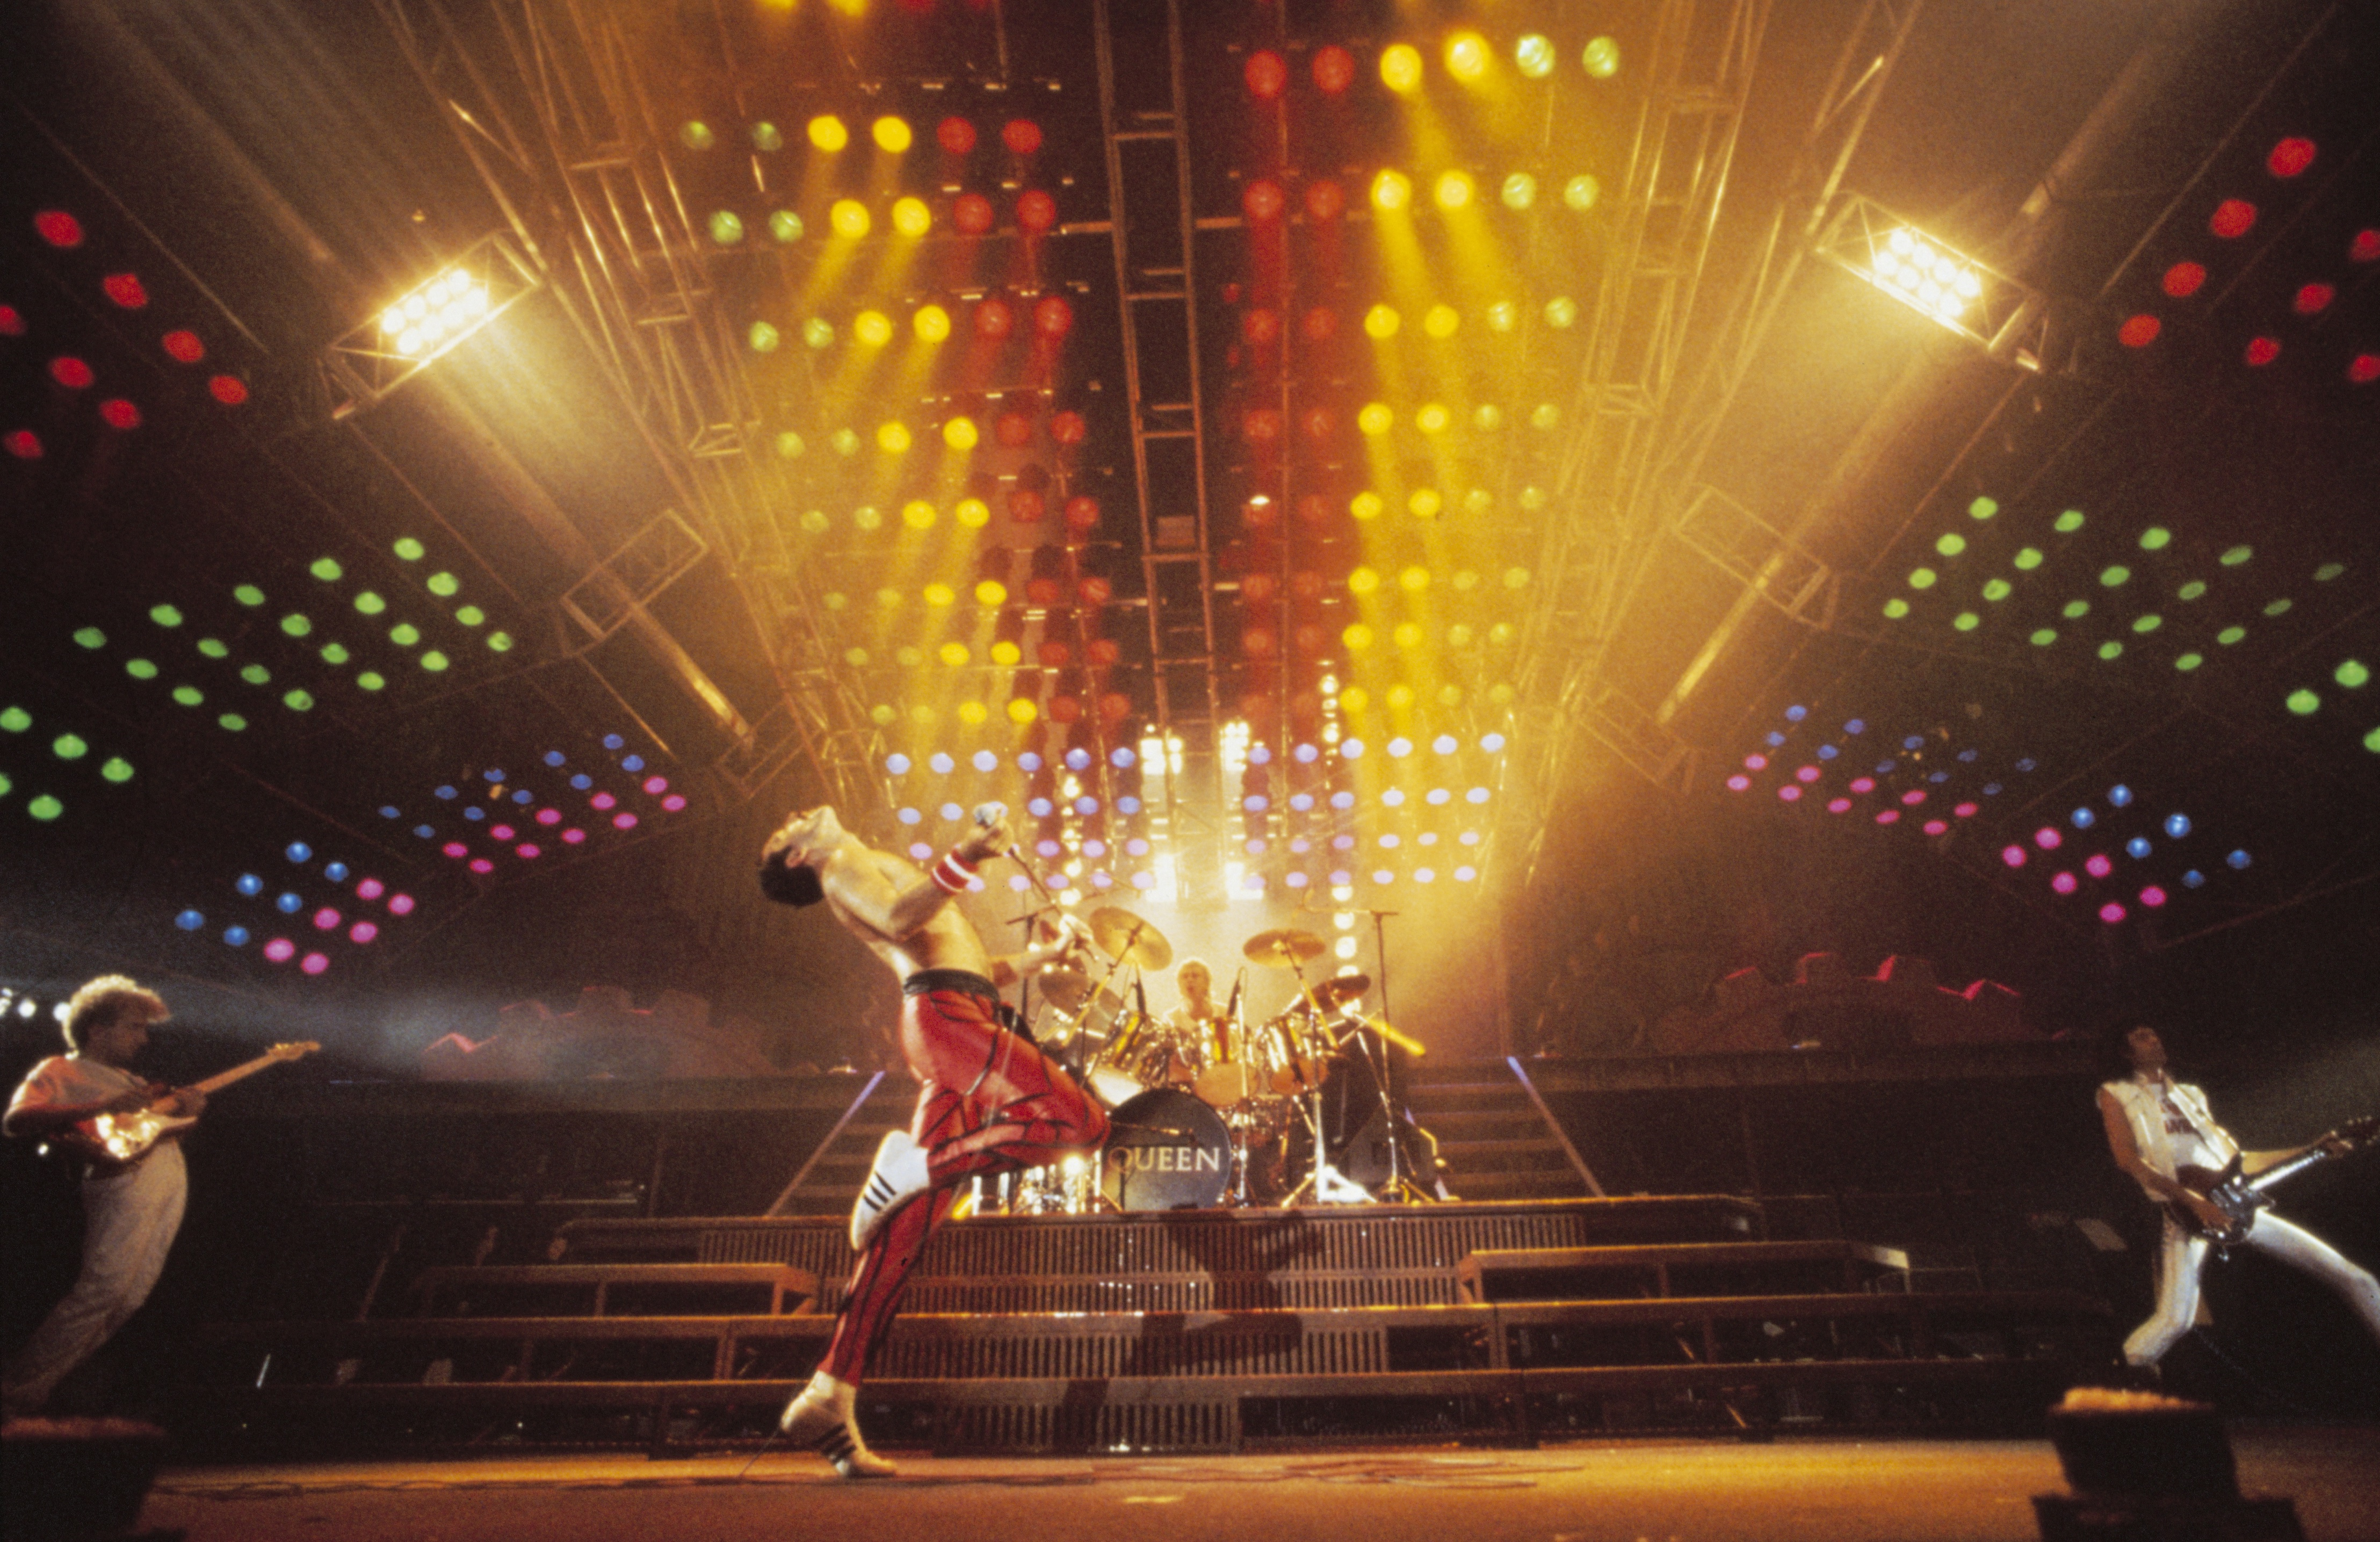 queen-photo-by-denis-o_u2019regan_-queen-productions-ltd_-taken-at-nec-birmingham-during-the-works-tour-1984.jpg